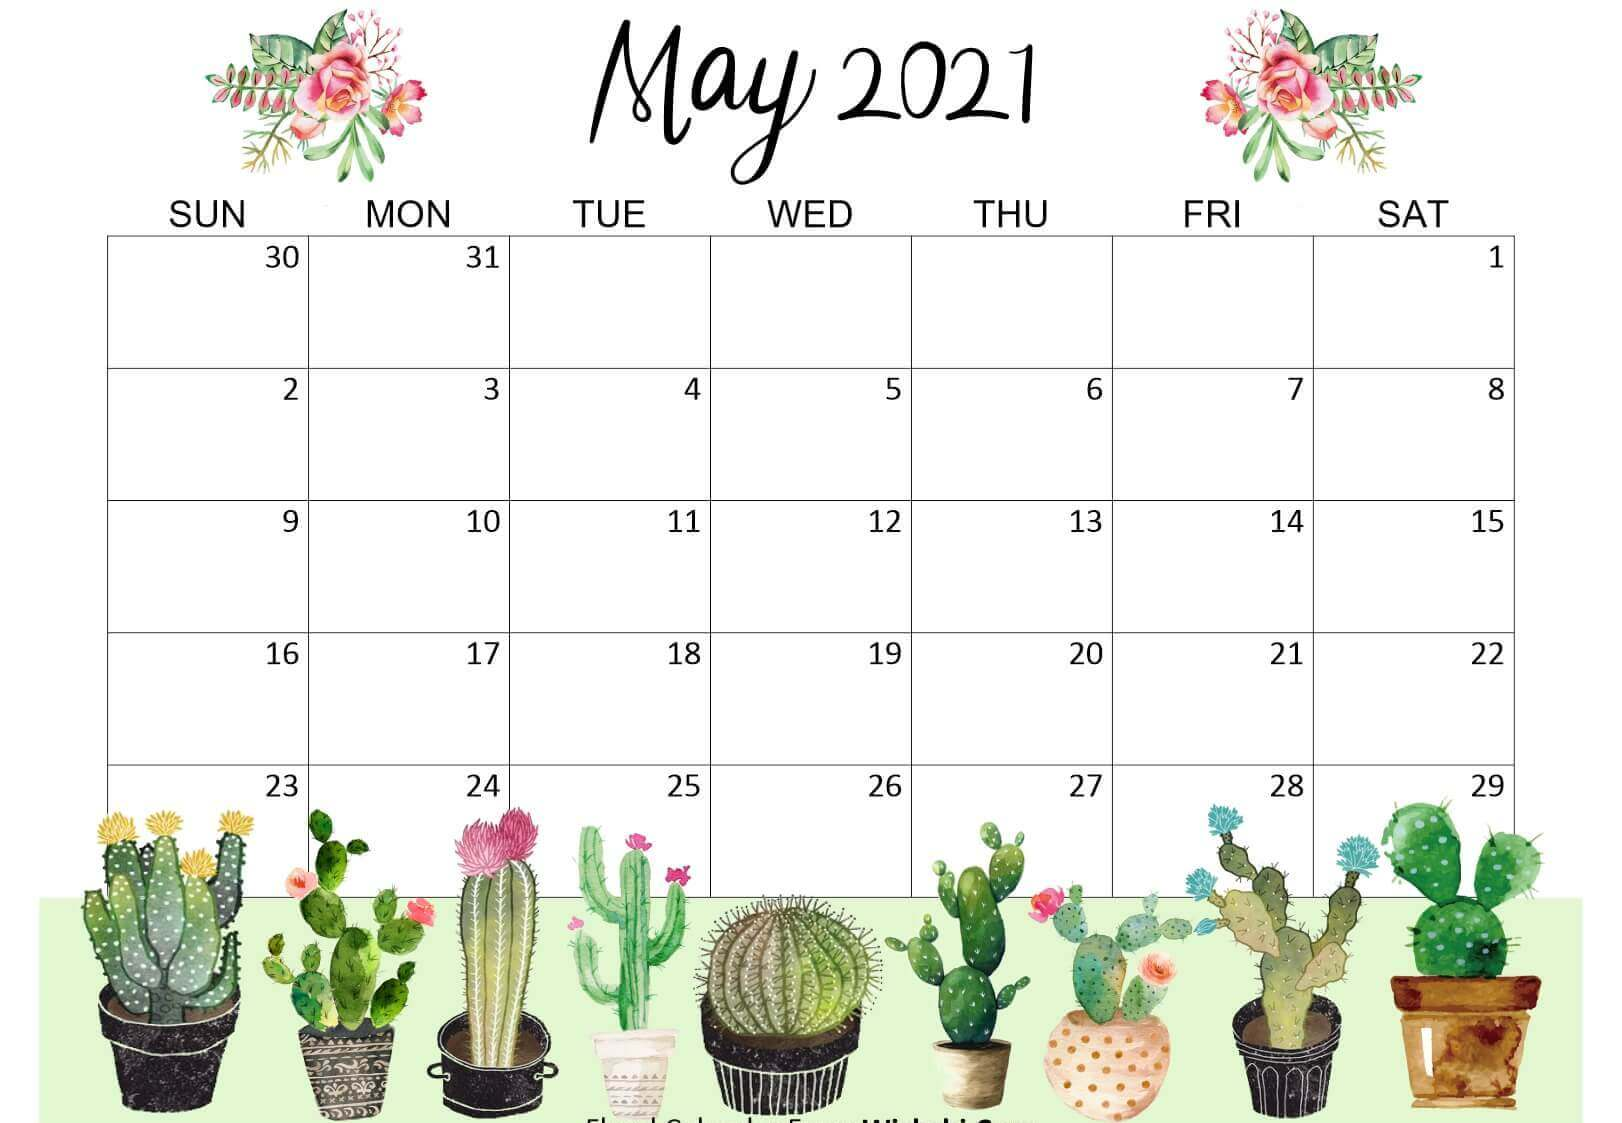 Cute May 2021 Floral Calendar Wallpaper